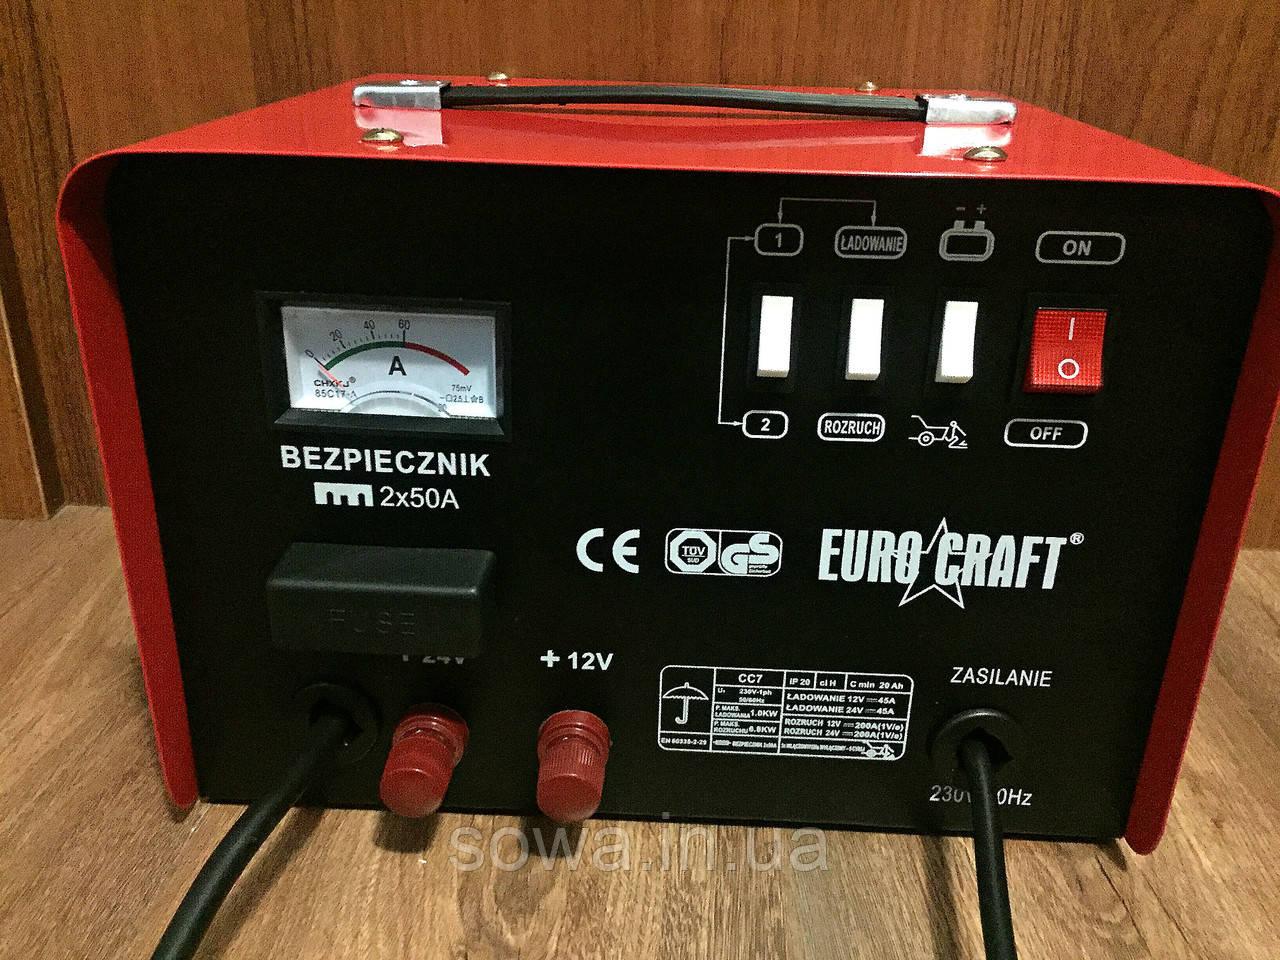 ✔️ Пуско зарядное устройство Euro Craft СС7 / 200 А, 3 кВт